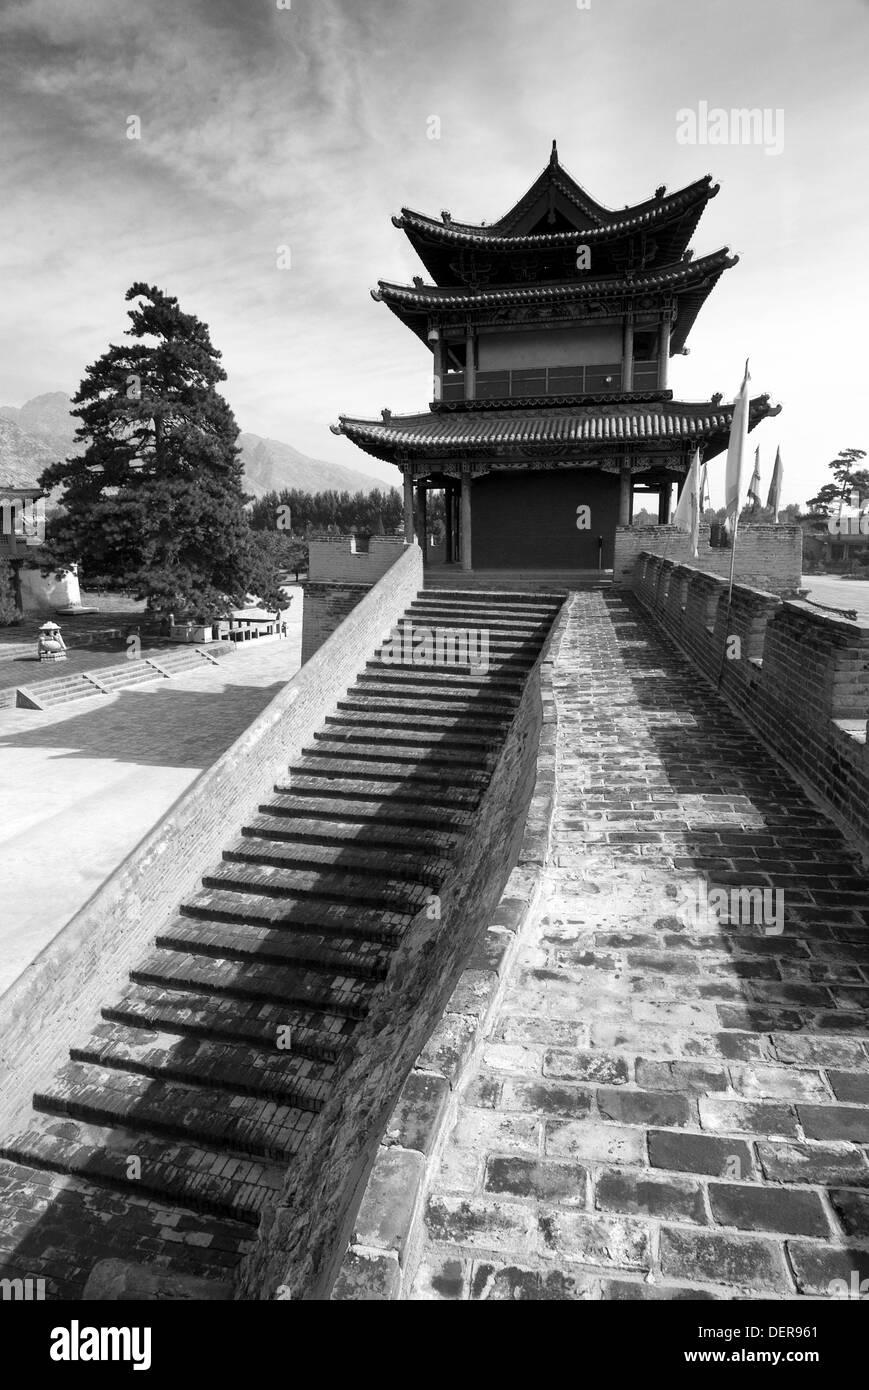 Meidai lamasery, Baotou, Inner Mongolia, China - Stock Image